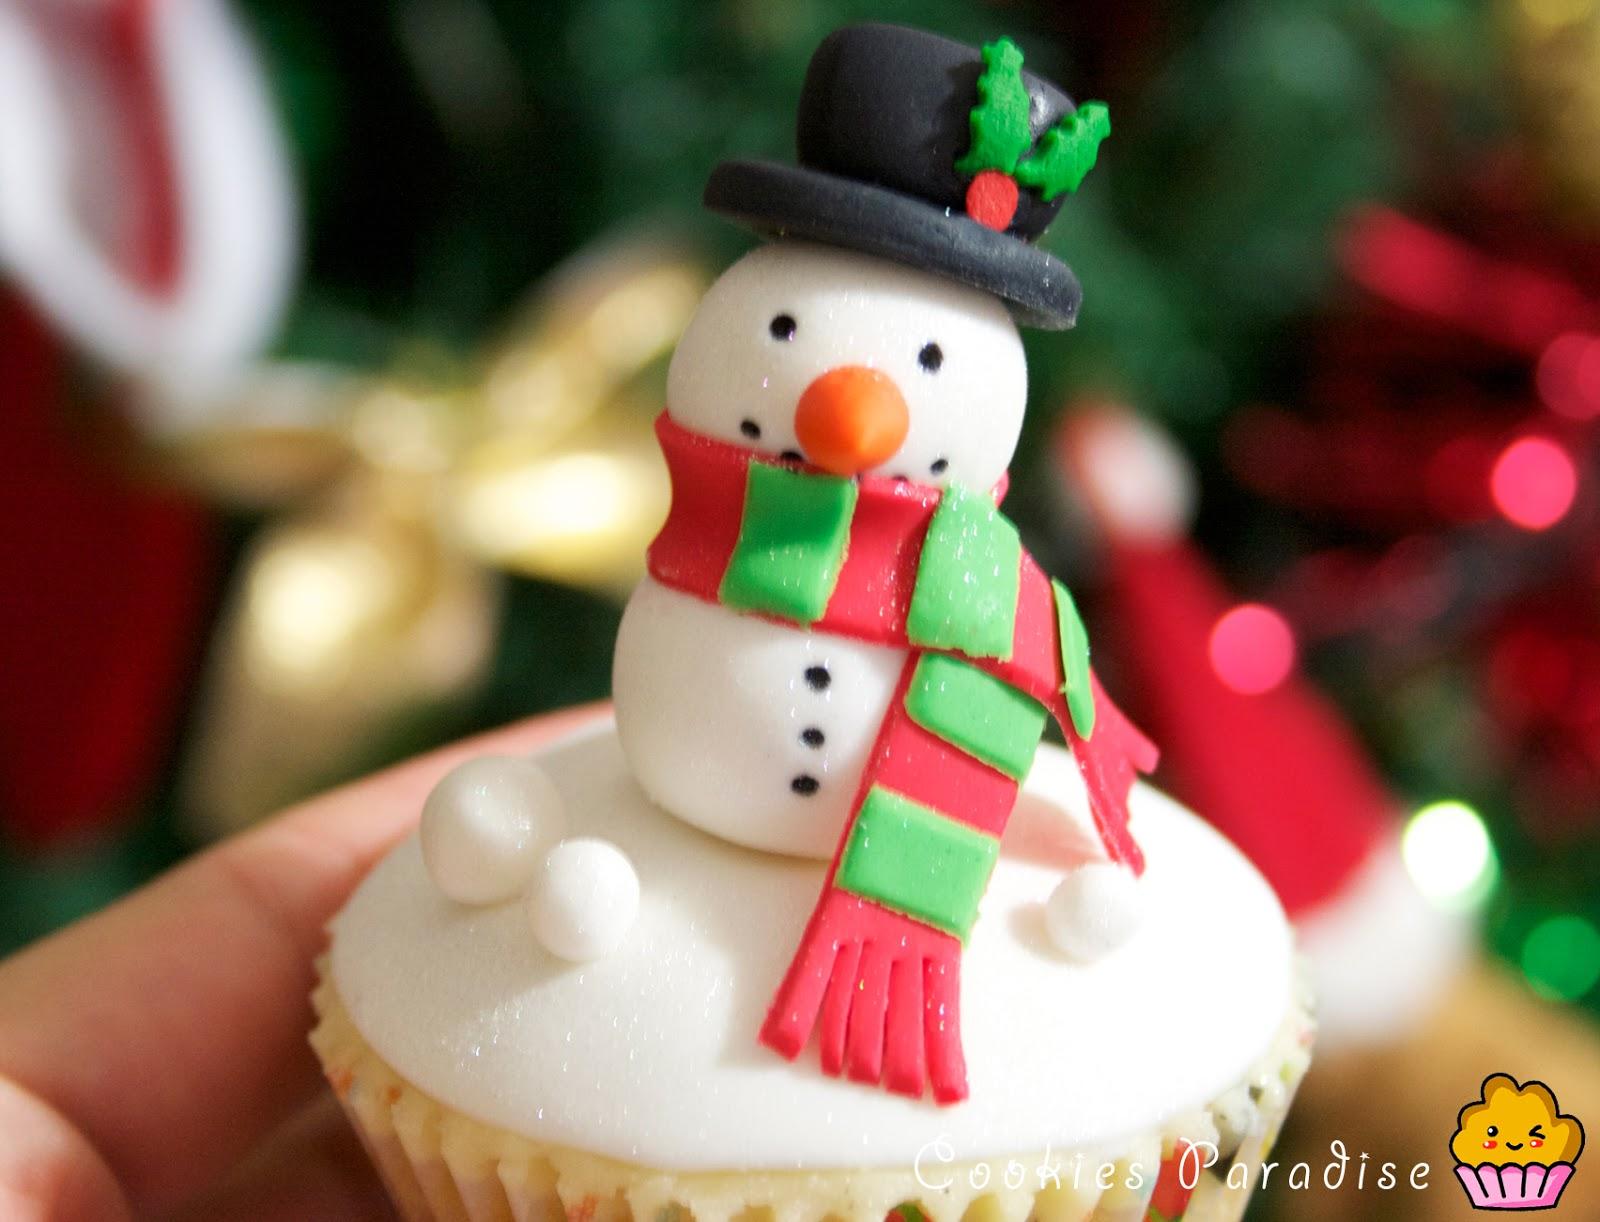 Cookies paradise receta de cupcakes navide os y como for Decoracion en cupcakes